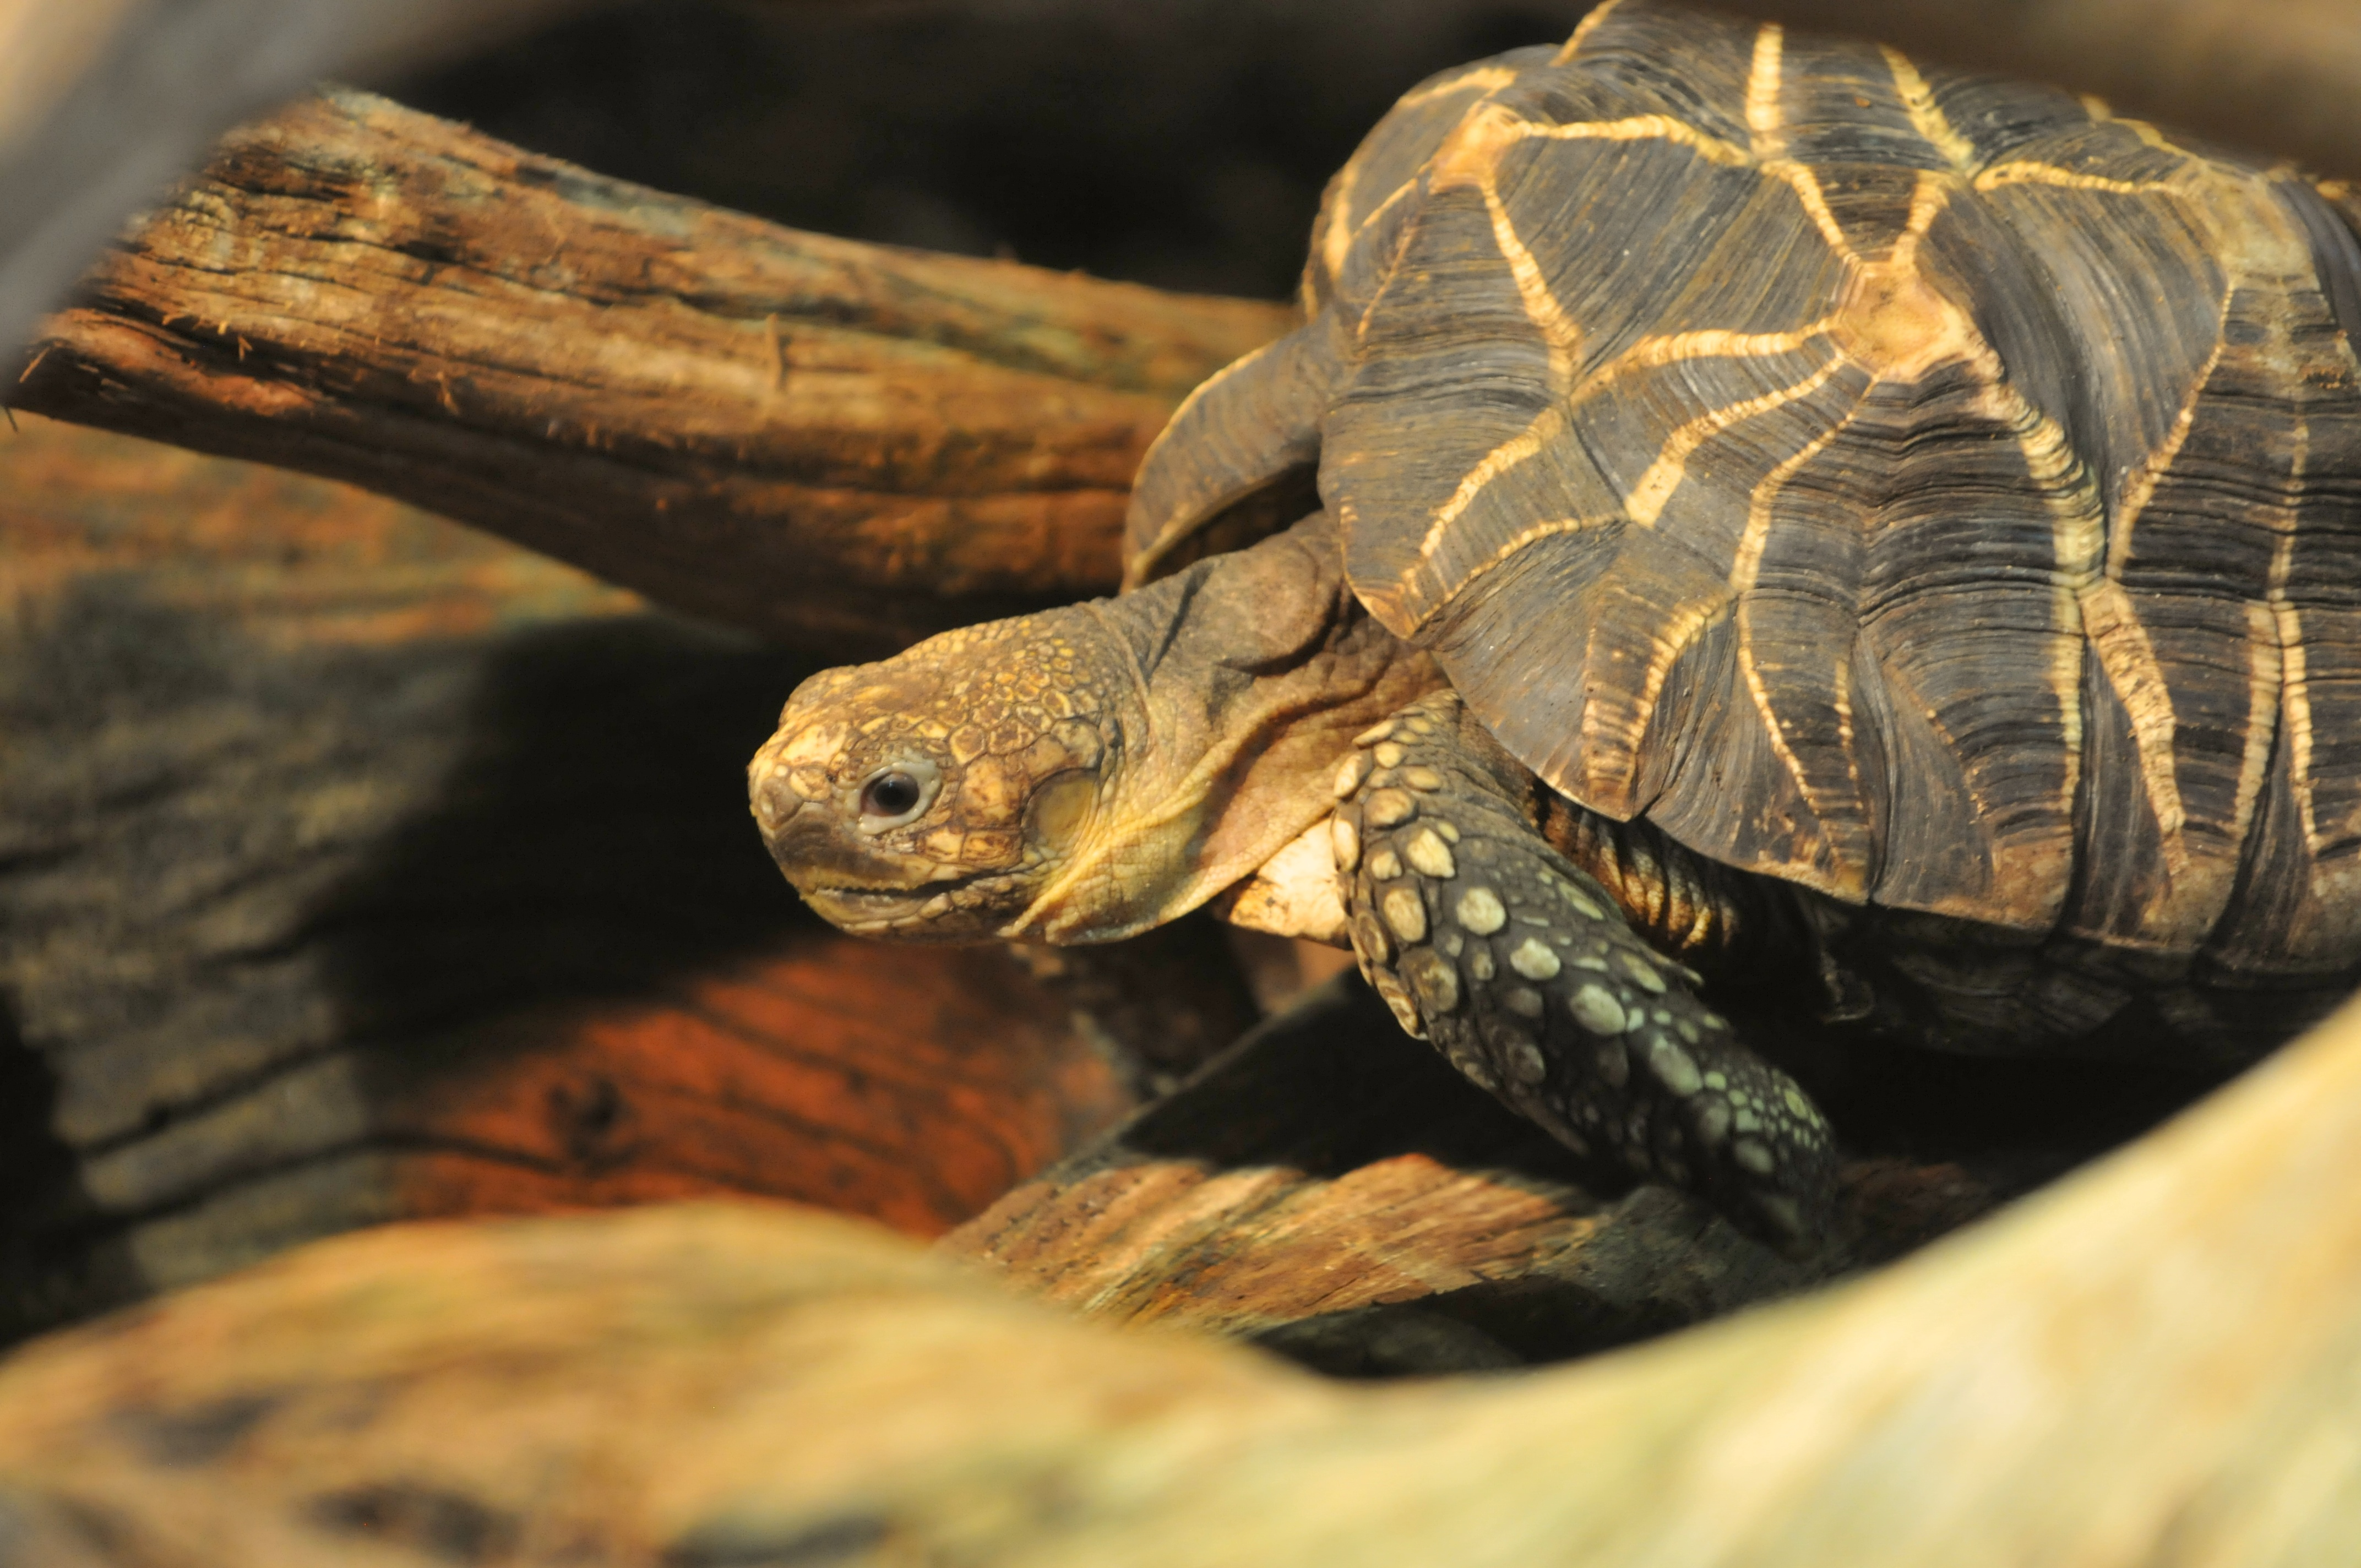 https://upload.wikimedia.org/wikipedia/commons/9/93/Geochelone_platynota_-Toronto_Zoo%2C_Ontario%2C_Canada-8a.jpg